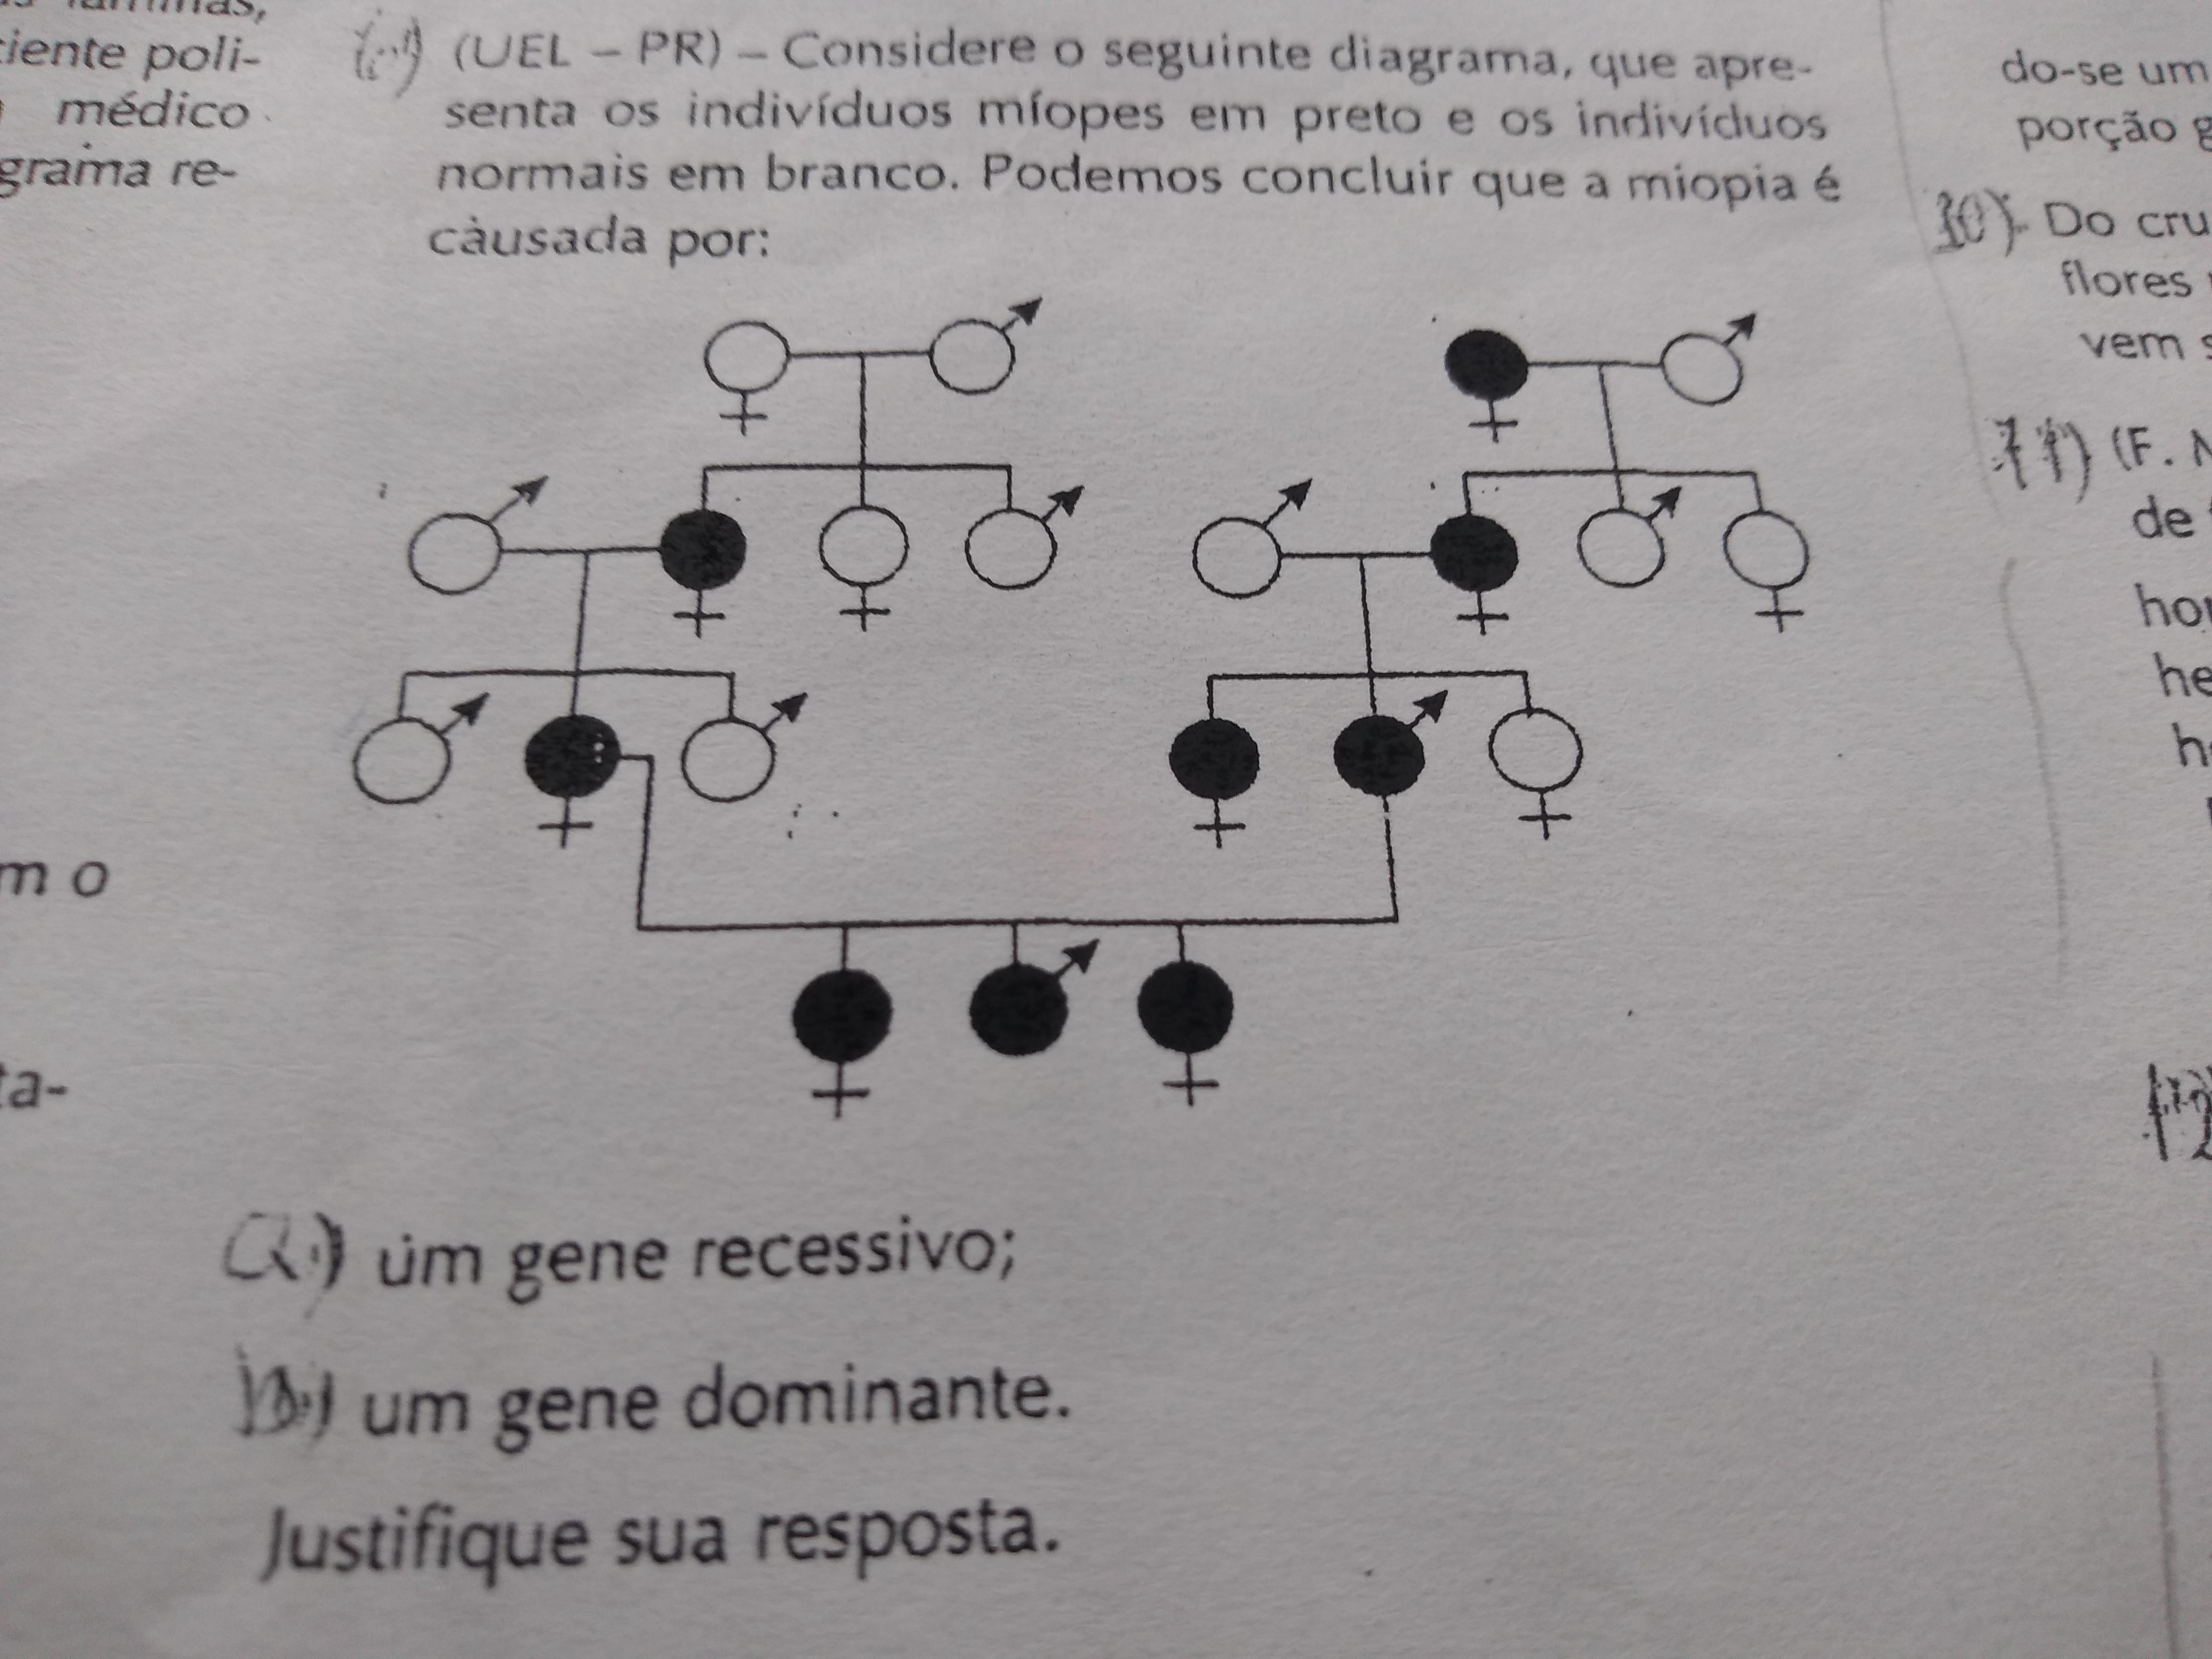 A fost identificata gena miopiei - localuri-bucuresti.ro